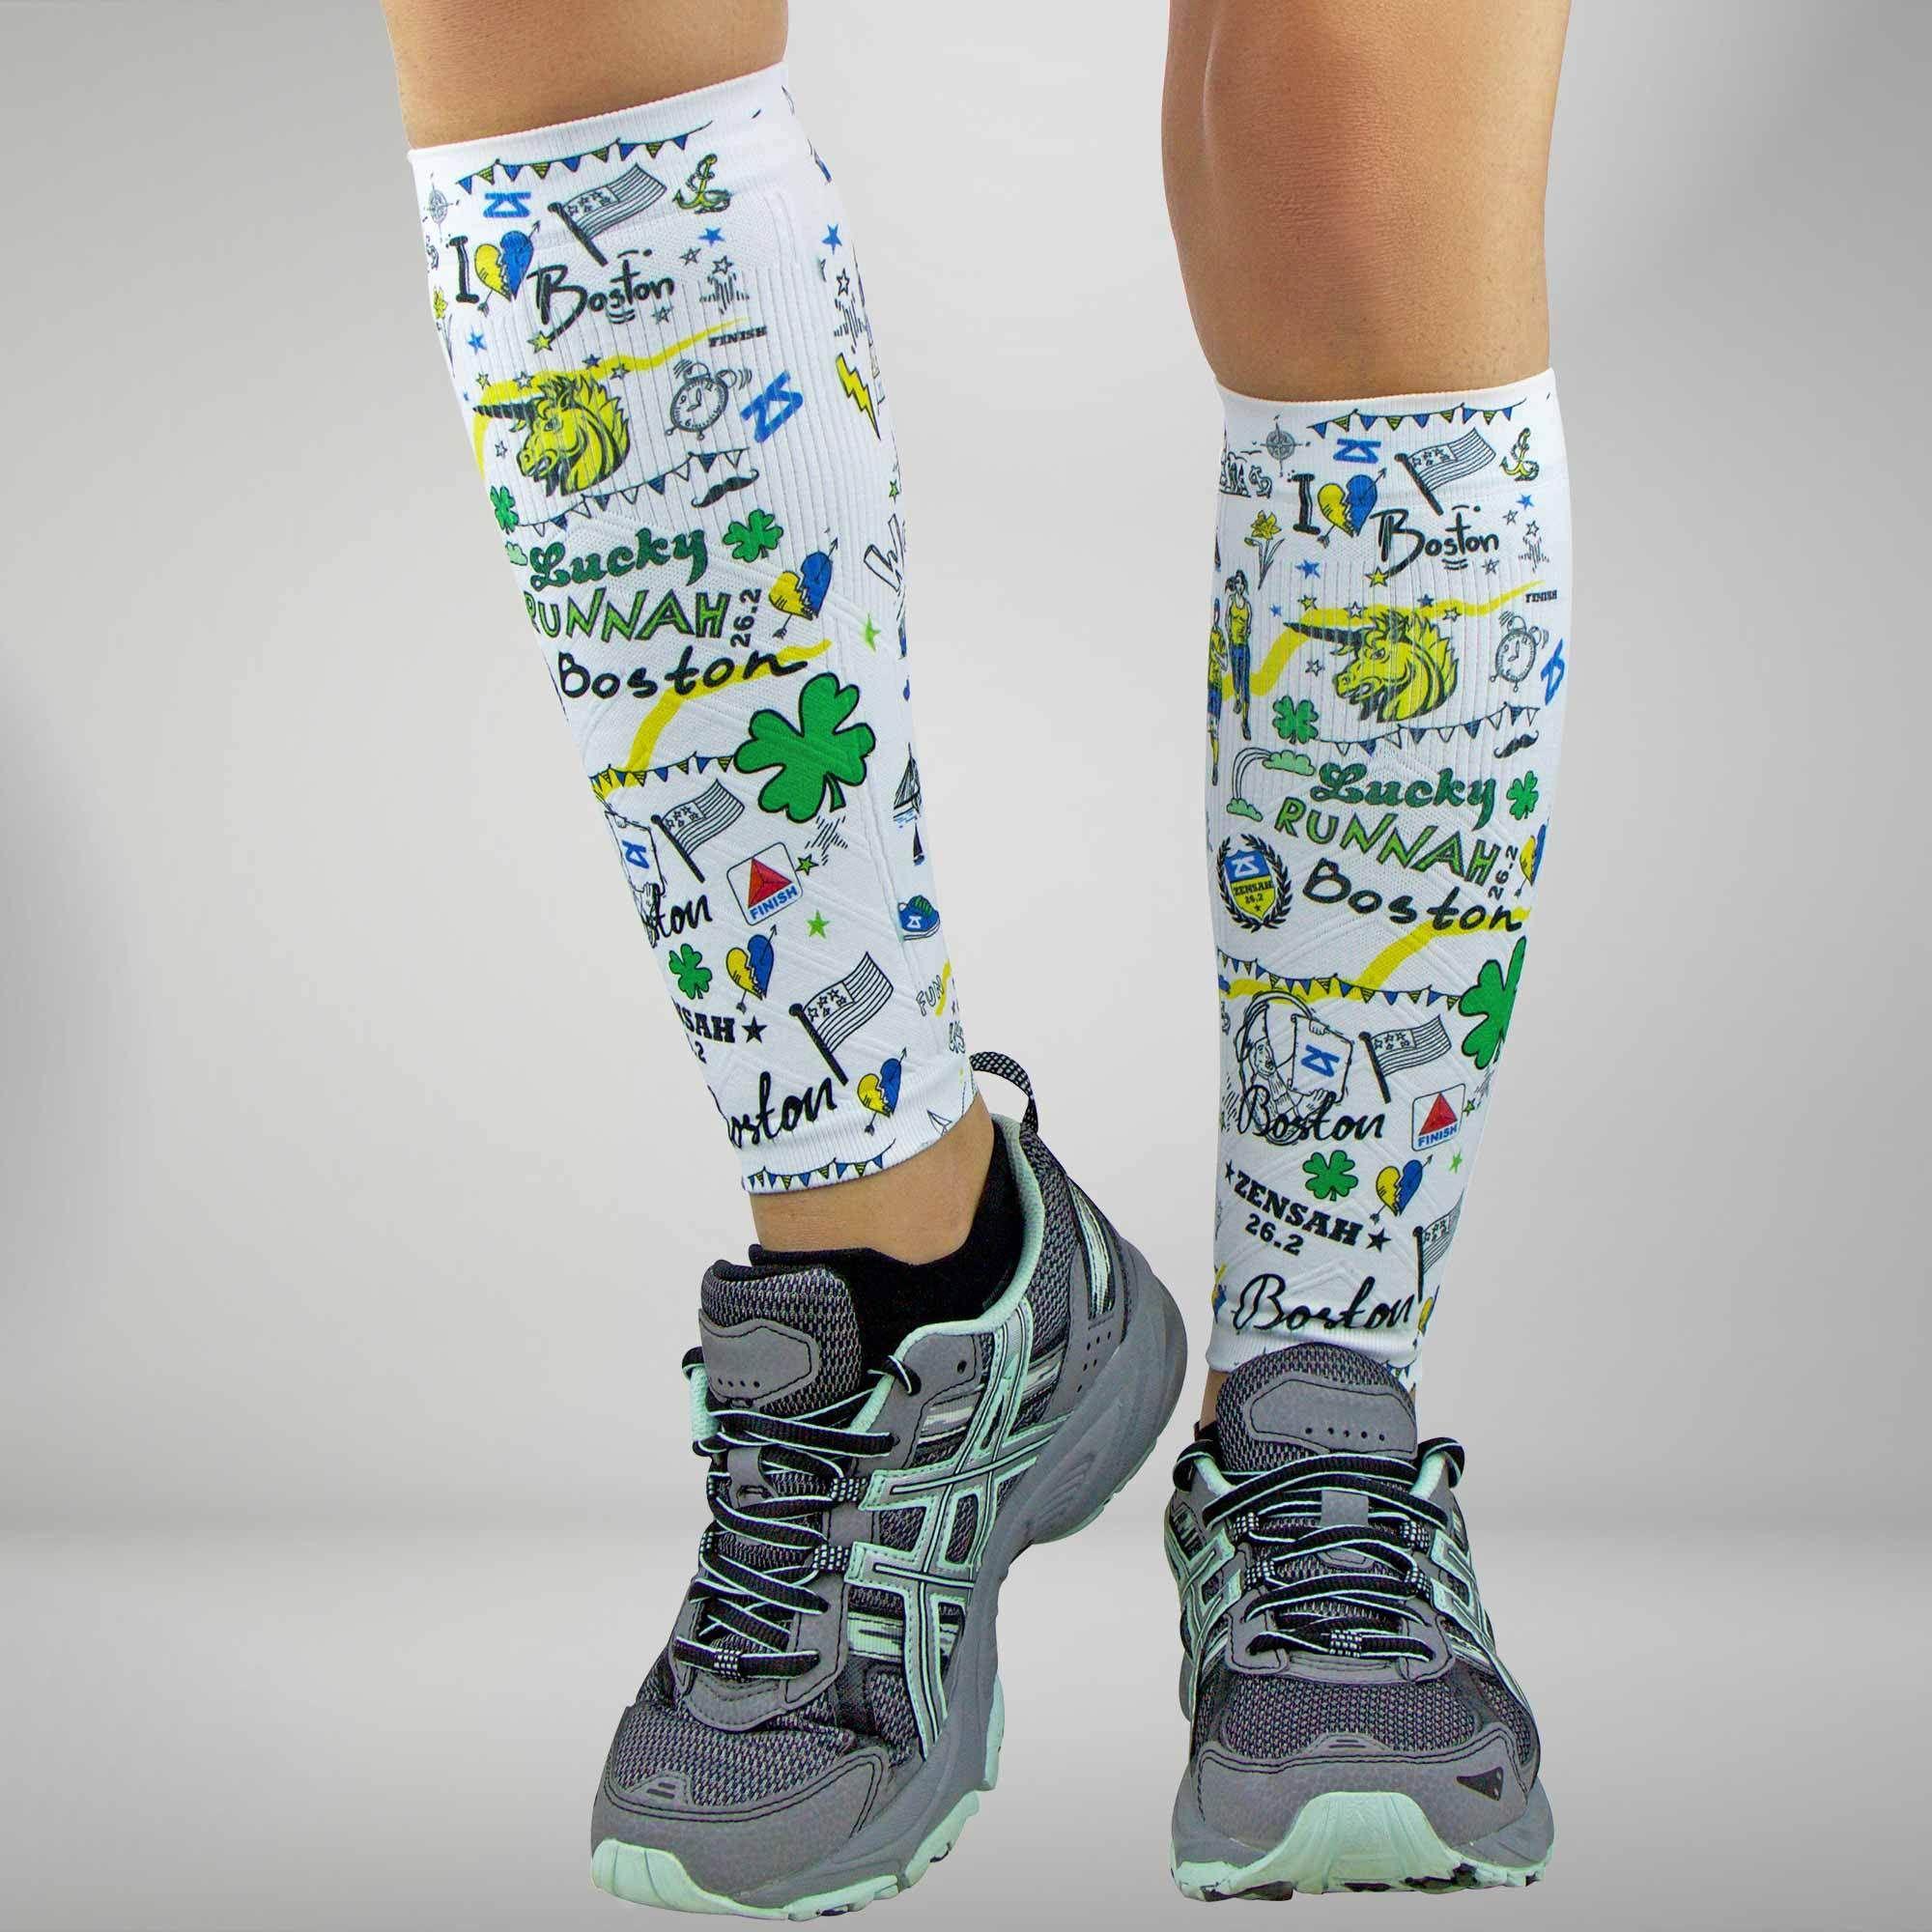 Boston compression leg sleeves compression leg sleeves